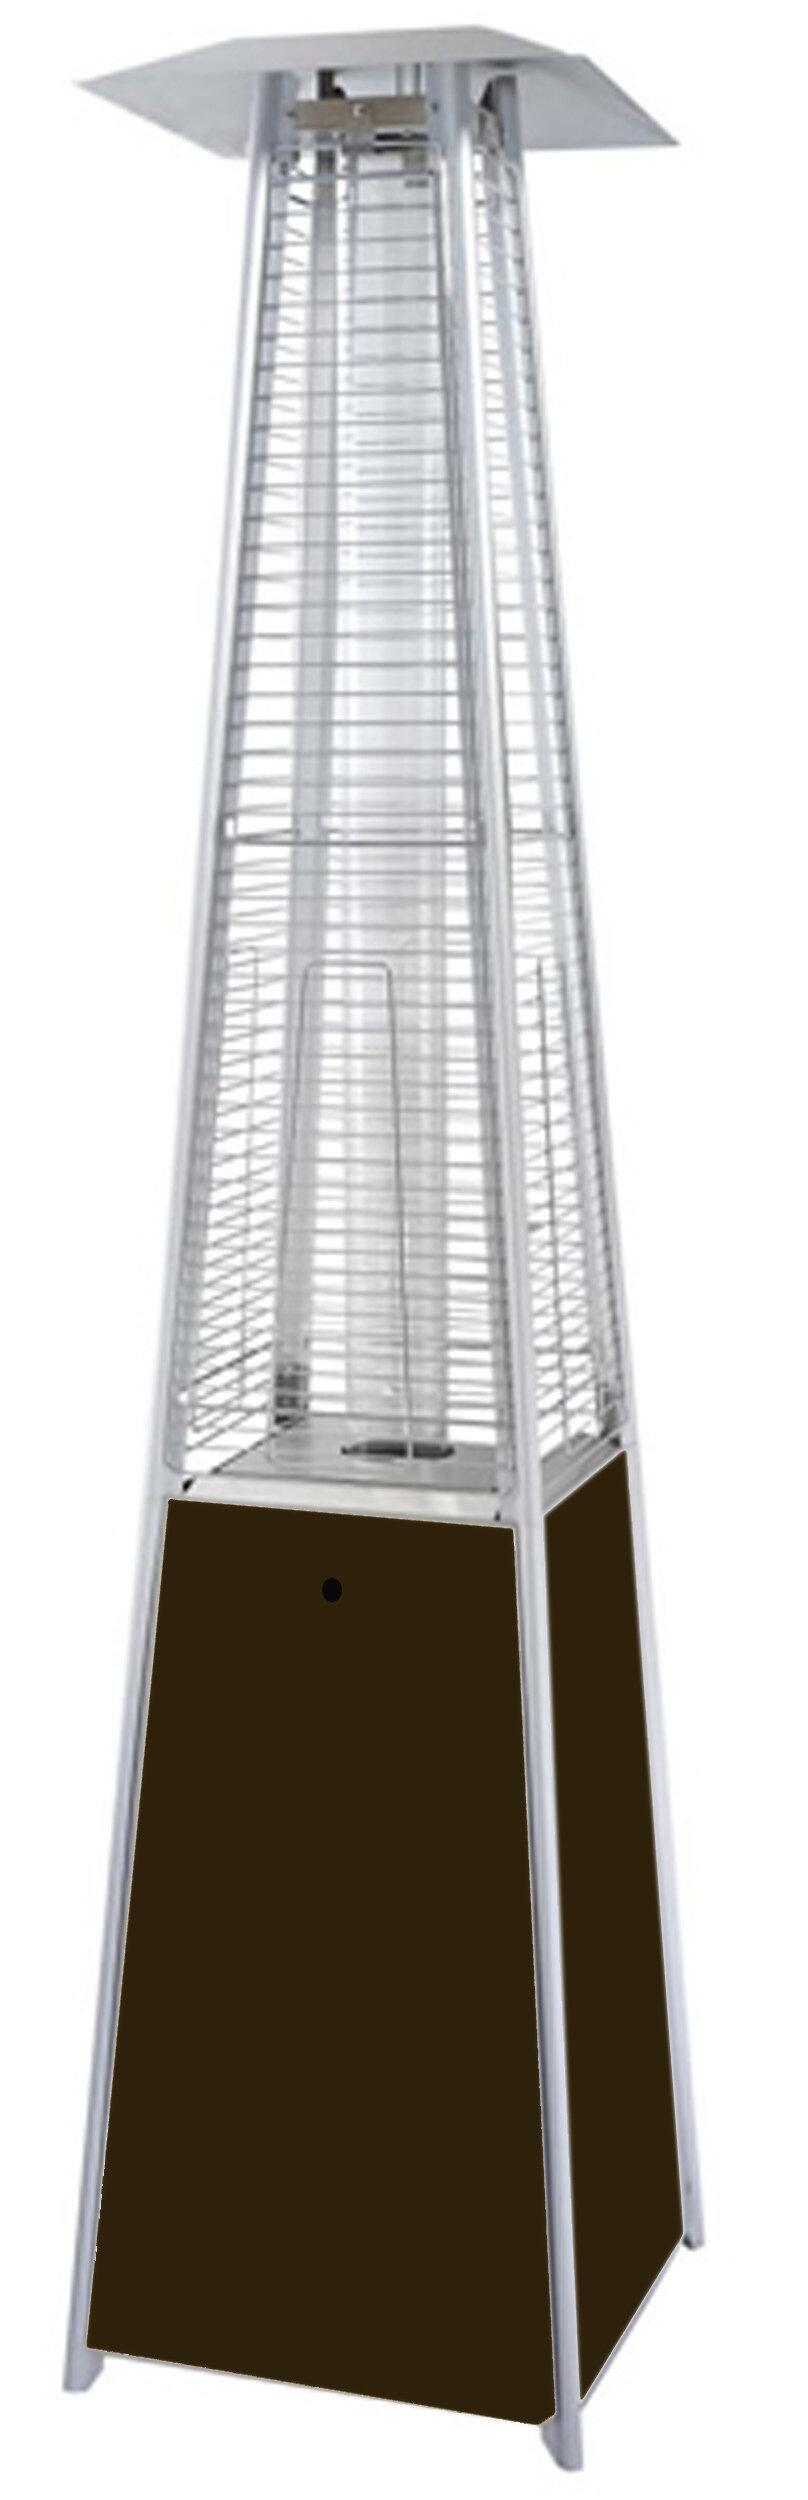 AZ Patio Heaters Tall 40,000 BTU Propane Patio Heater U0026 Reviews | Wayfair